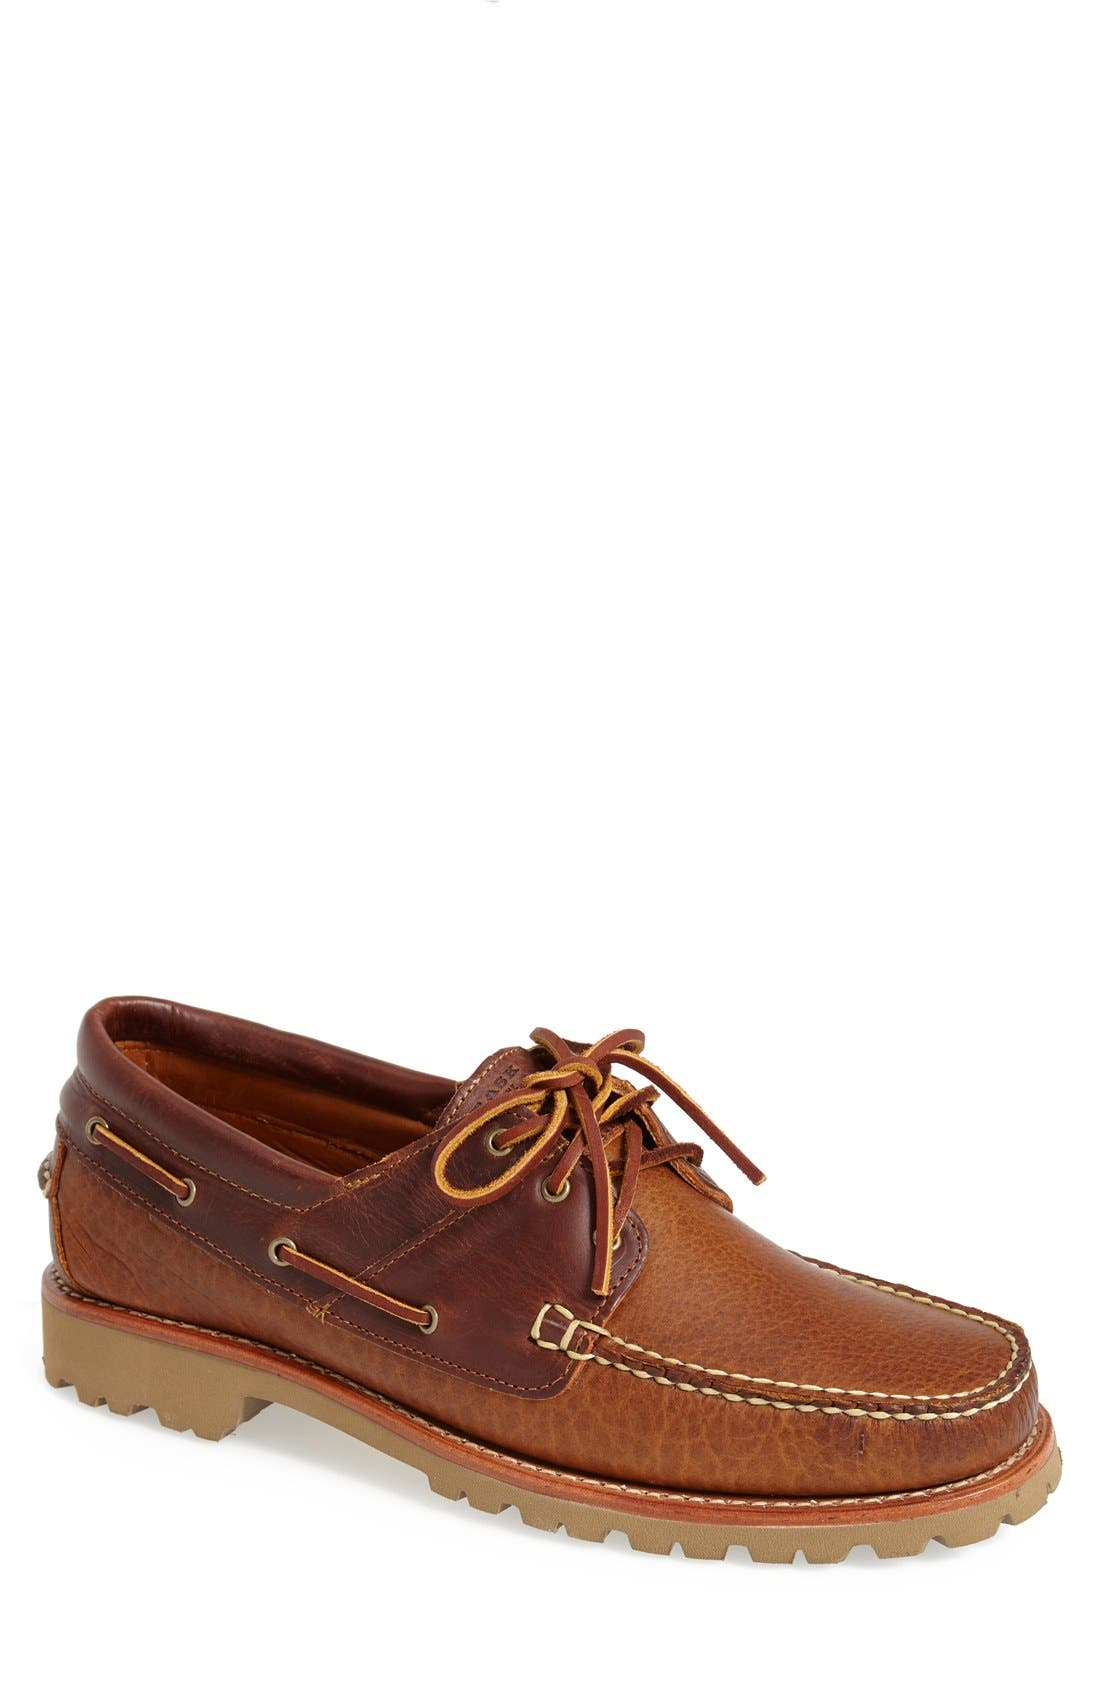 'Custer' Boat Shoe,                             Main thumbnail 1, color,